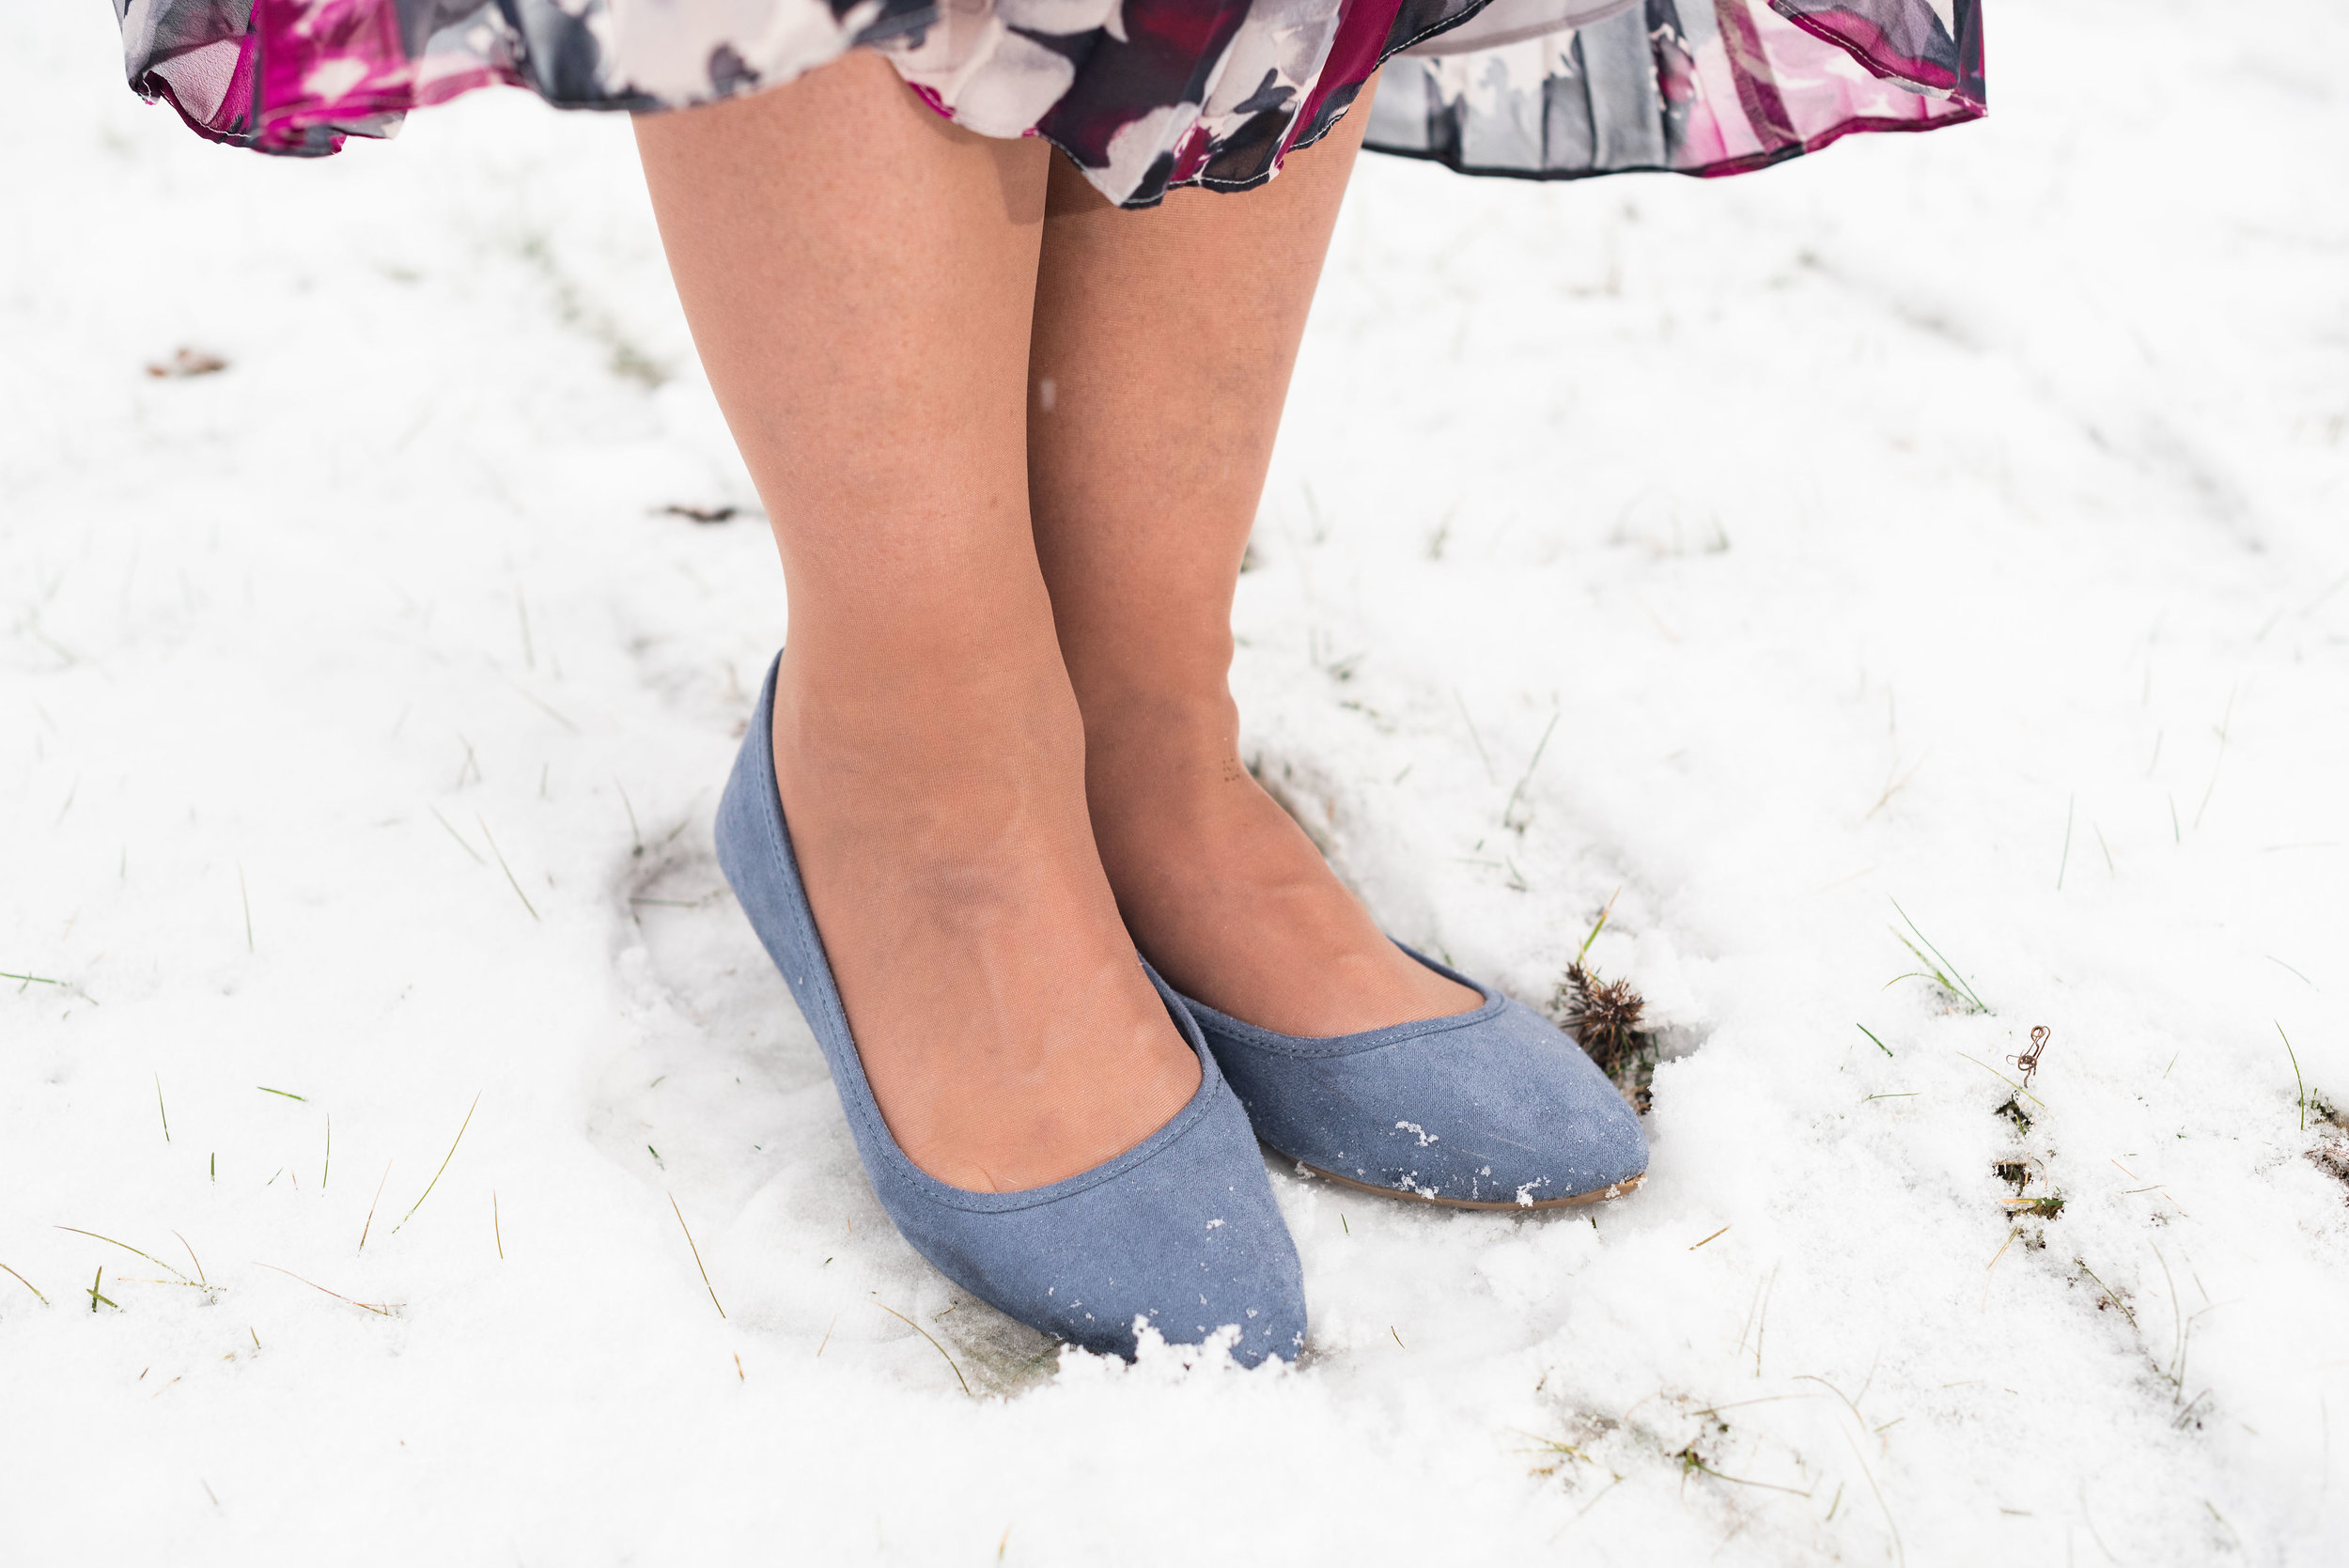 Pantone Spring 2017 - spring crocus, almost mauve and little boy blue